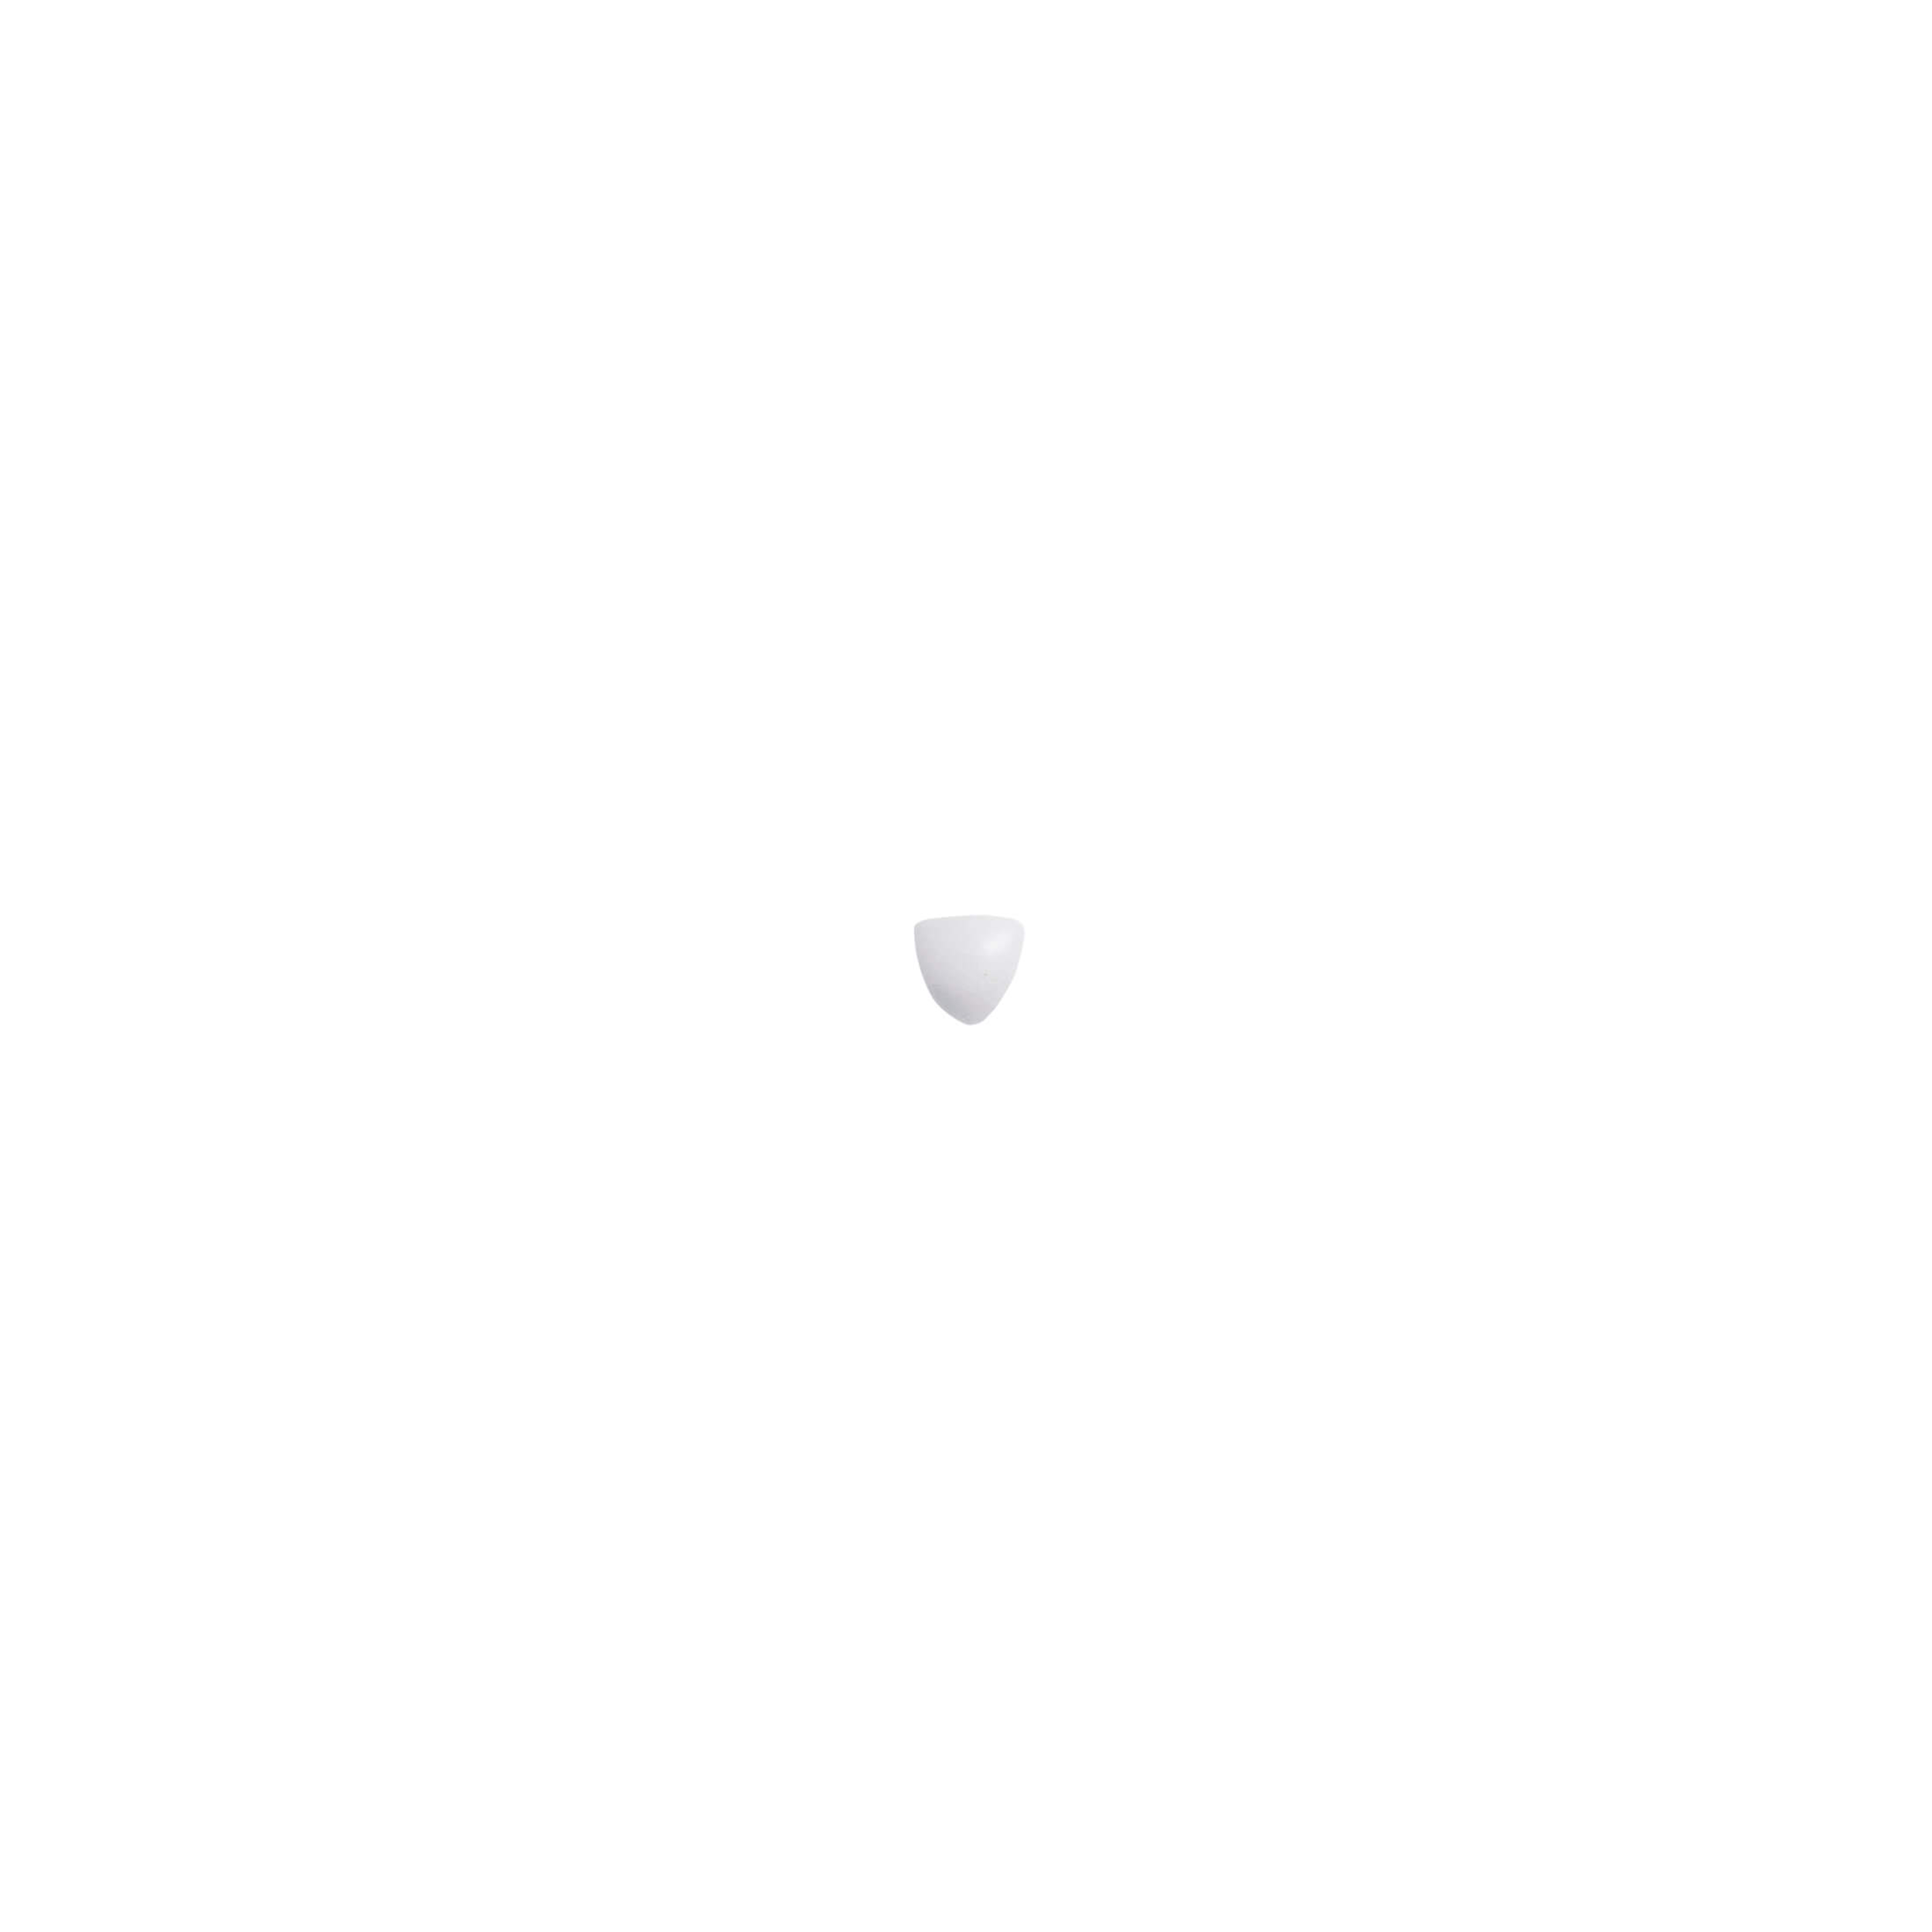 ADEH5034 - ANGULO BULLNOSE TRIM - 1.4 cm X 30 cm